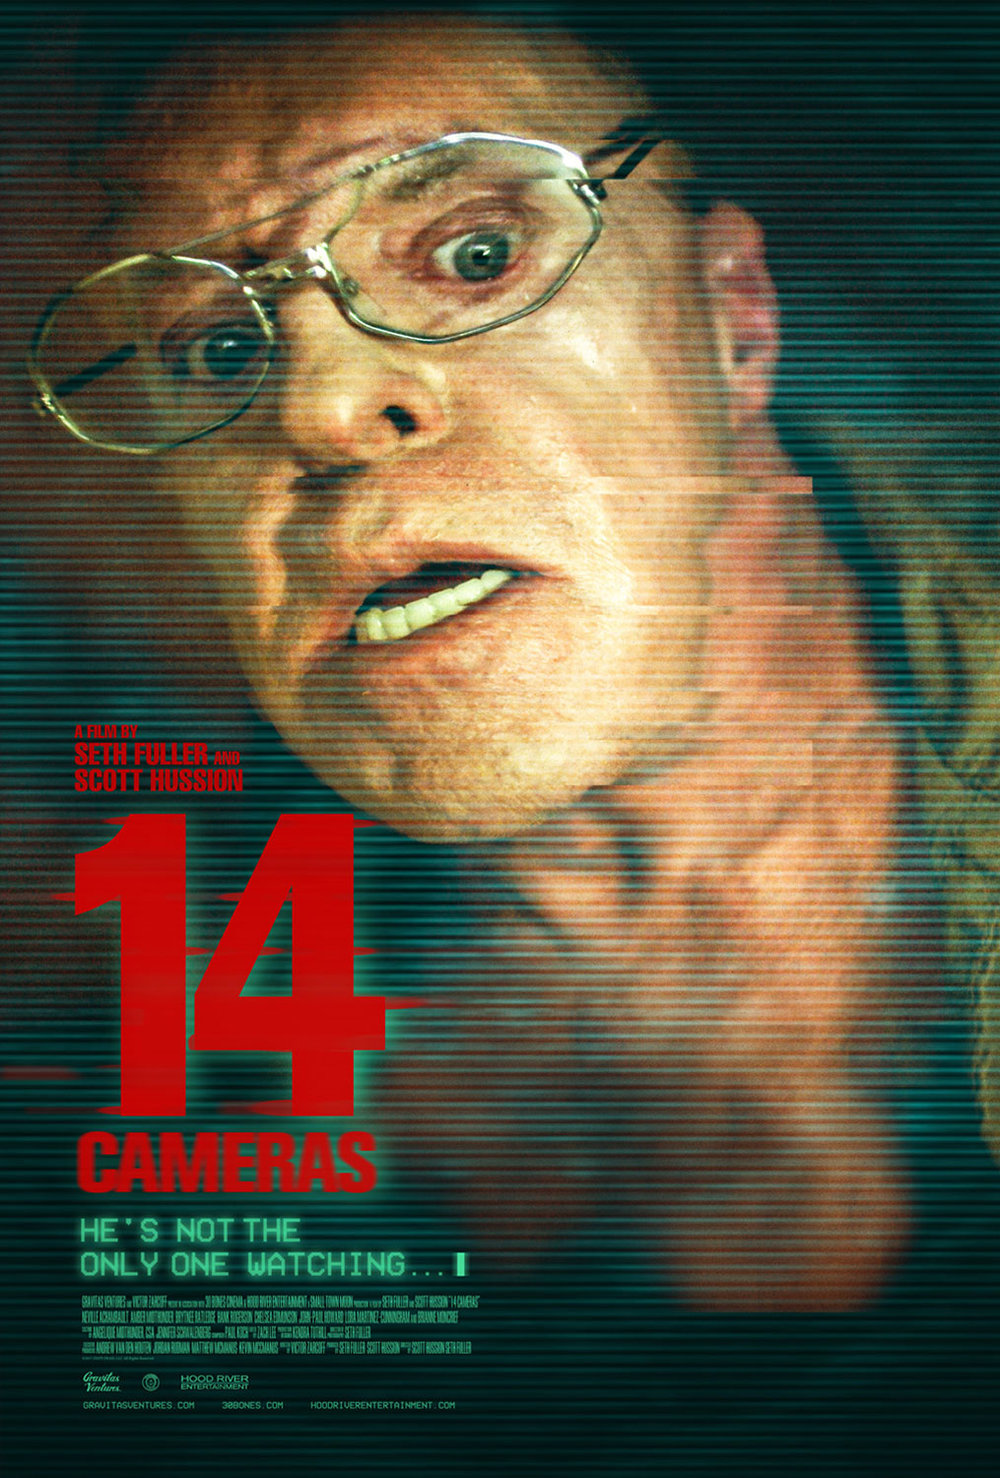 79thbroadway_14_cameras_movie_poster.jpg